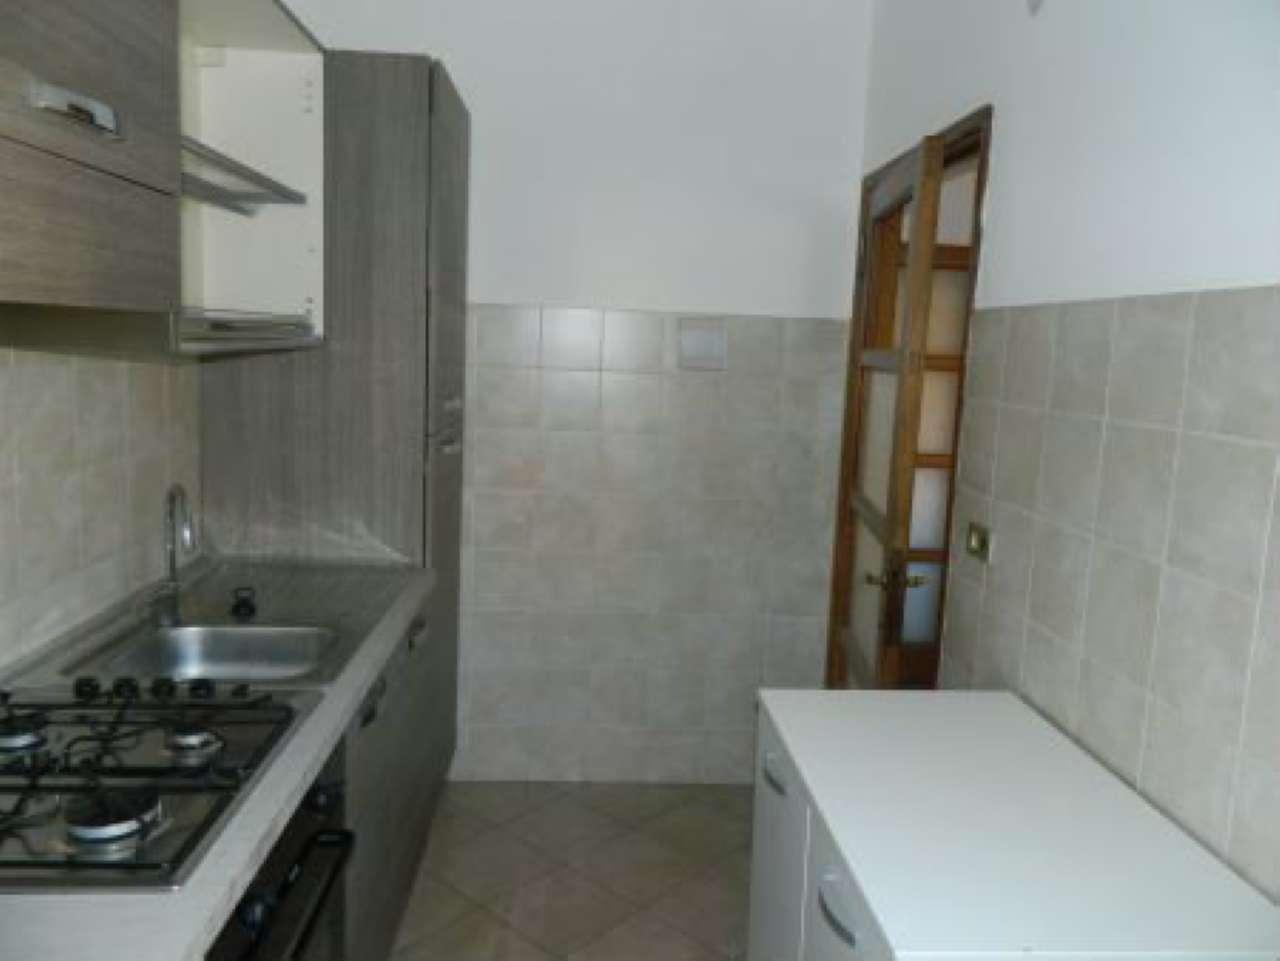 Appartamento, Gorizia, Centro città, Vendita - Sondrio (Sondrio)